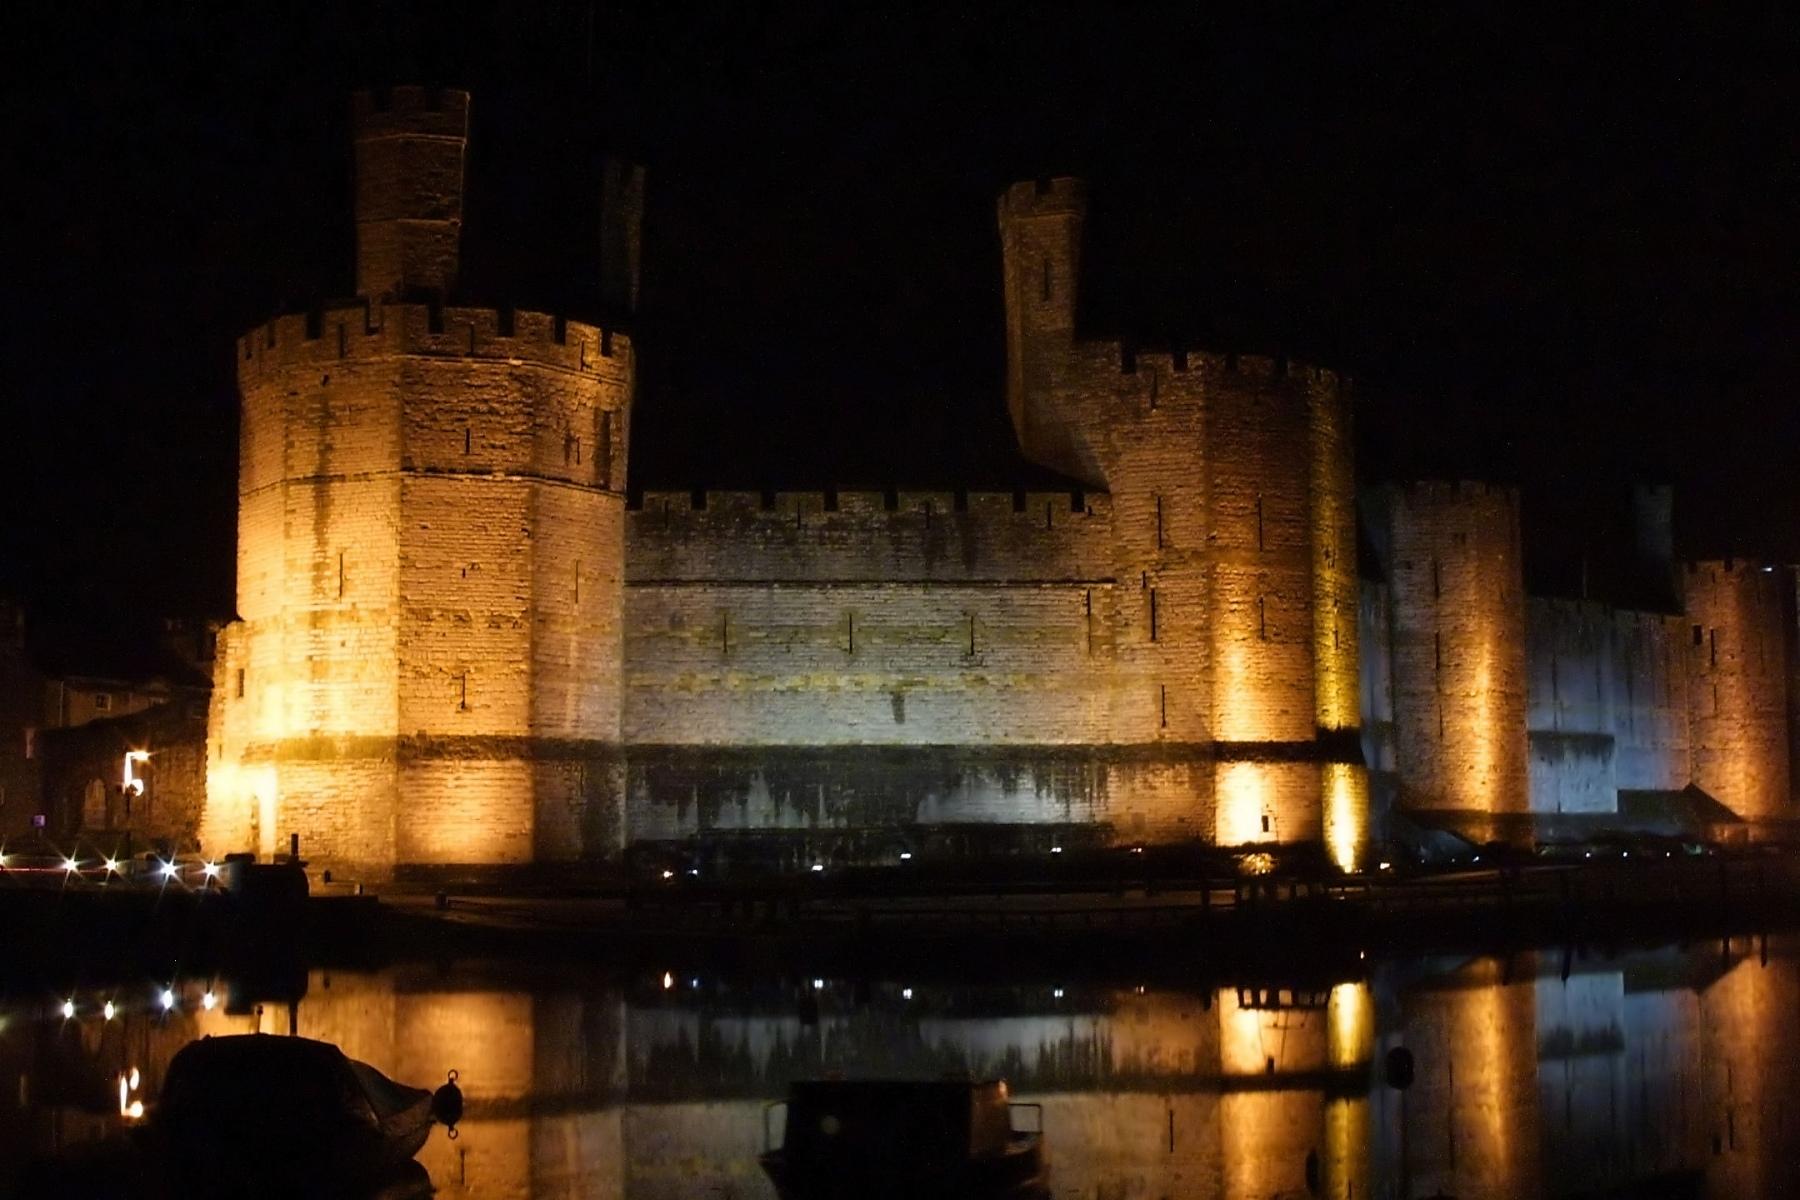 Night_Caernarfon_Castle1